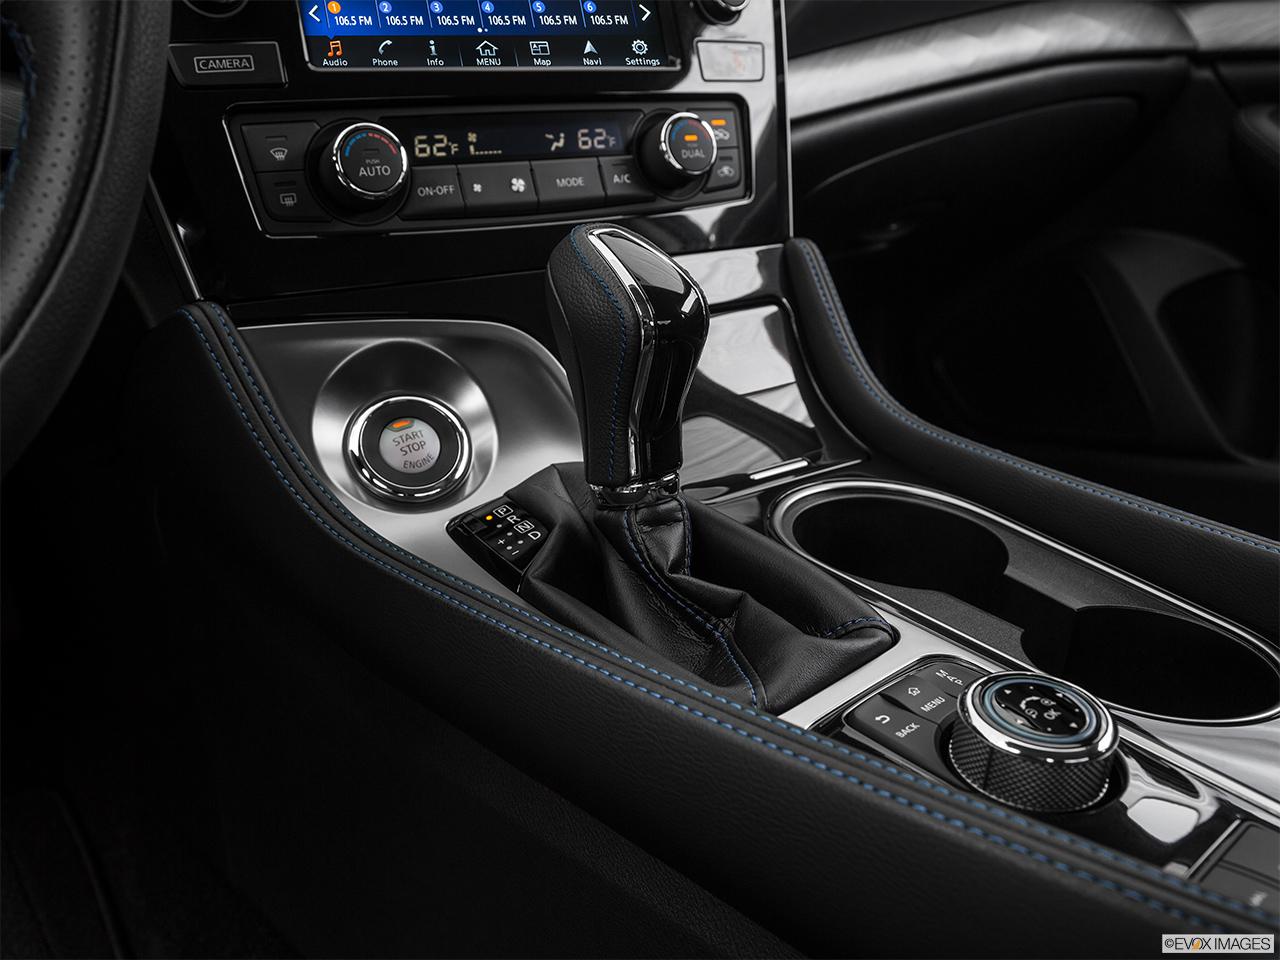 Car pictures list for nissan maxima 2018 3 5l sv kuwait for Mercedes benz of denver glendale co